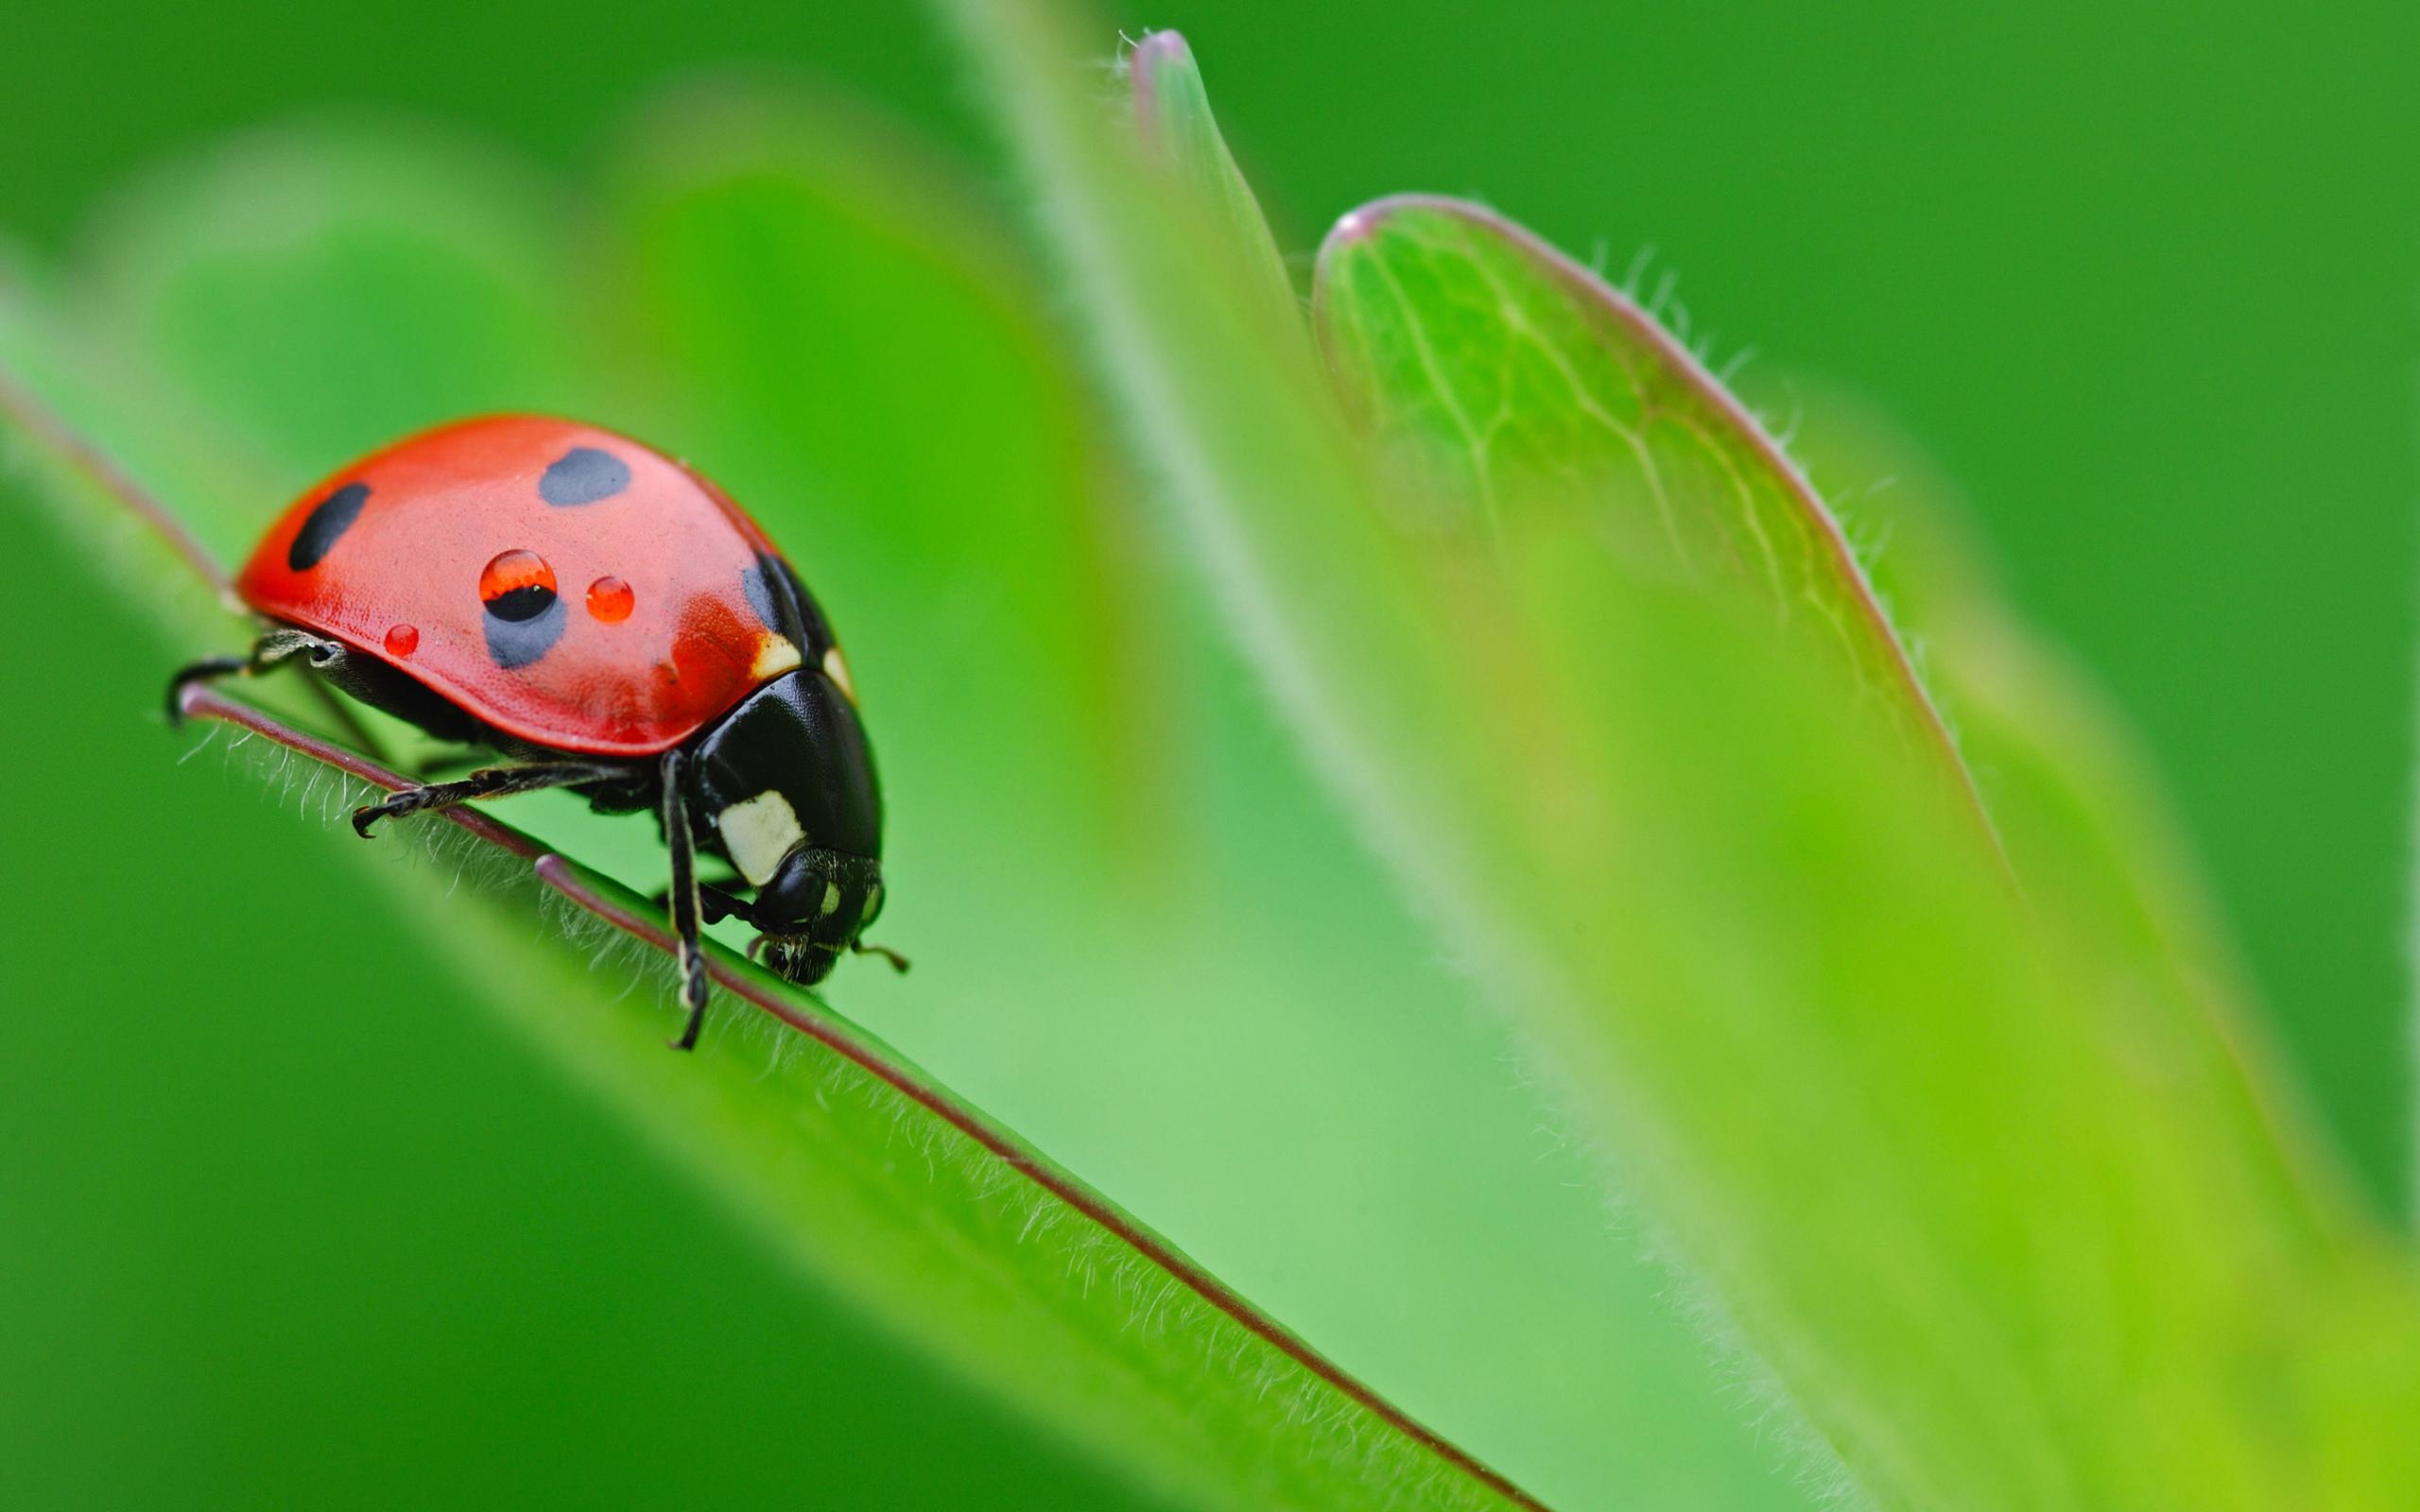 2560 x 1600 Wide Wallpapers Photos Desktop Wallpaper wp Ladybug on 2560x1600